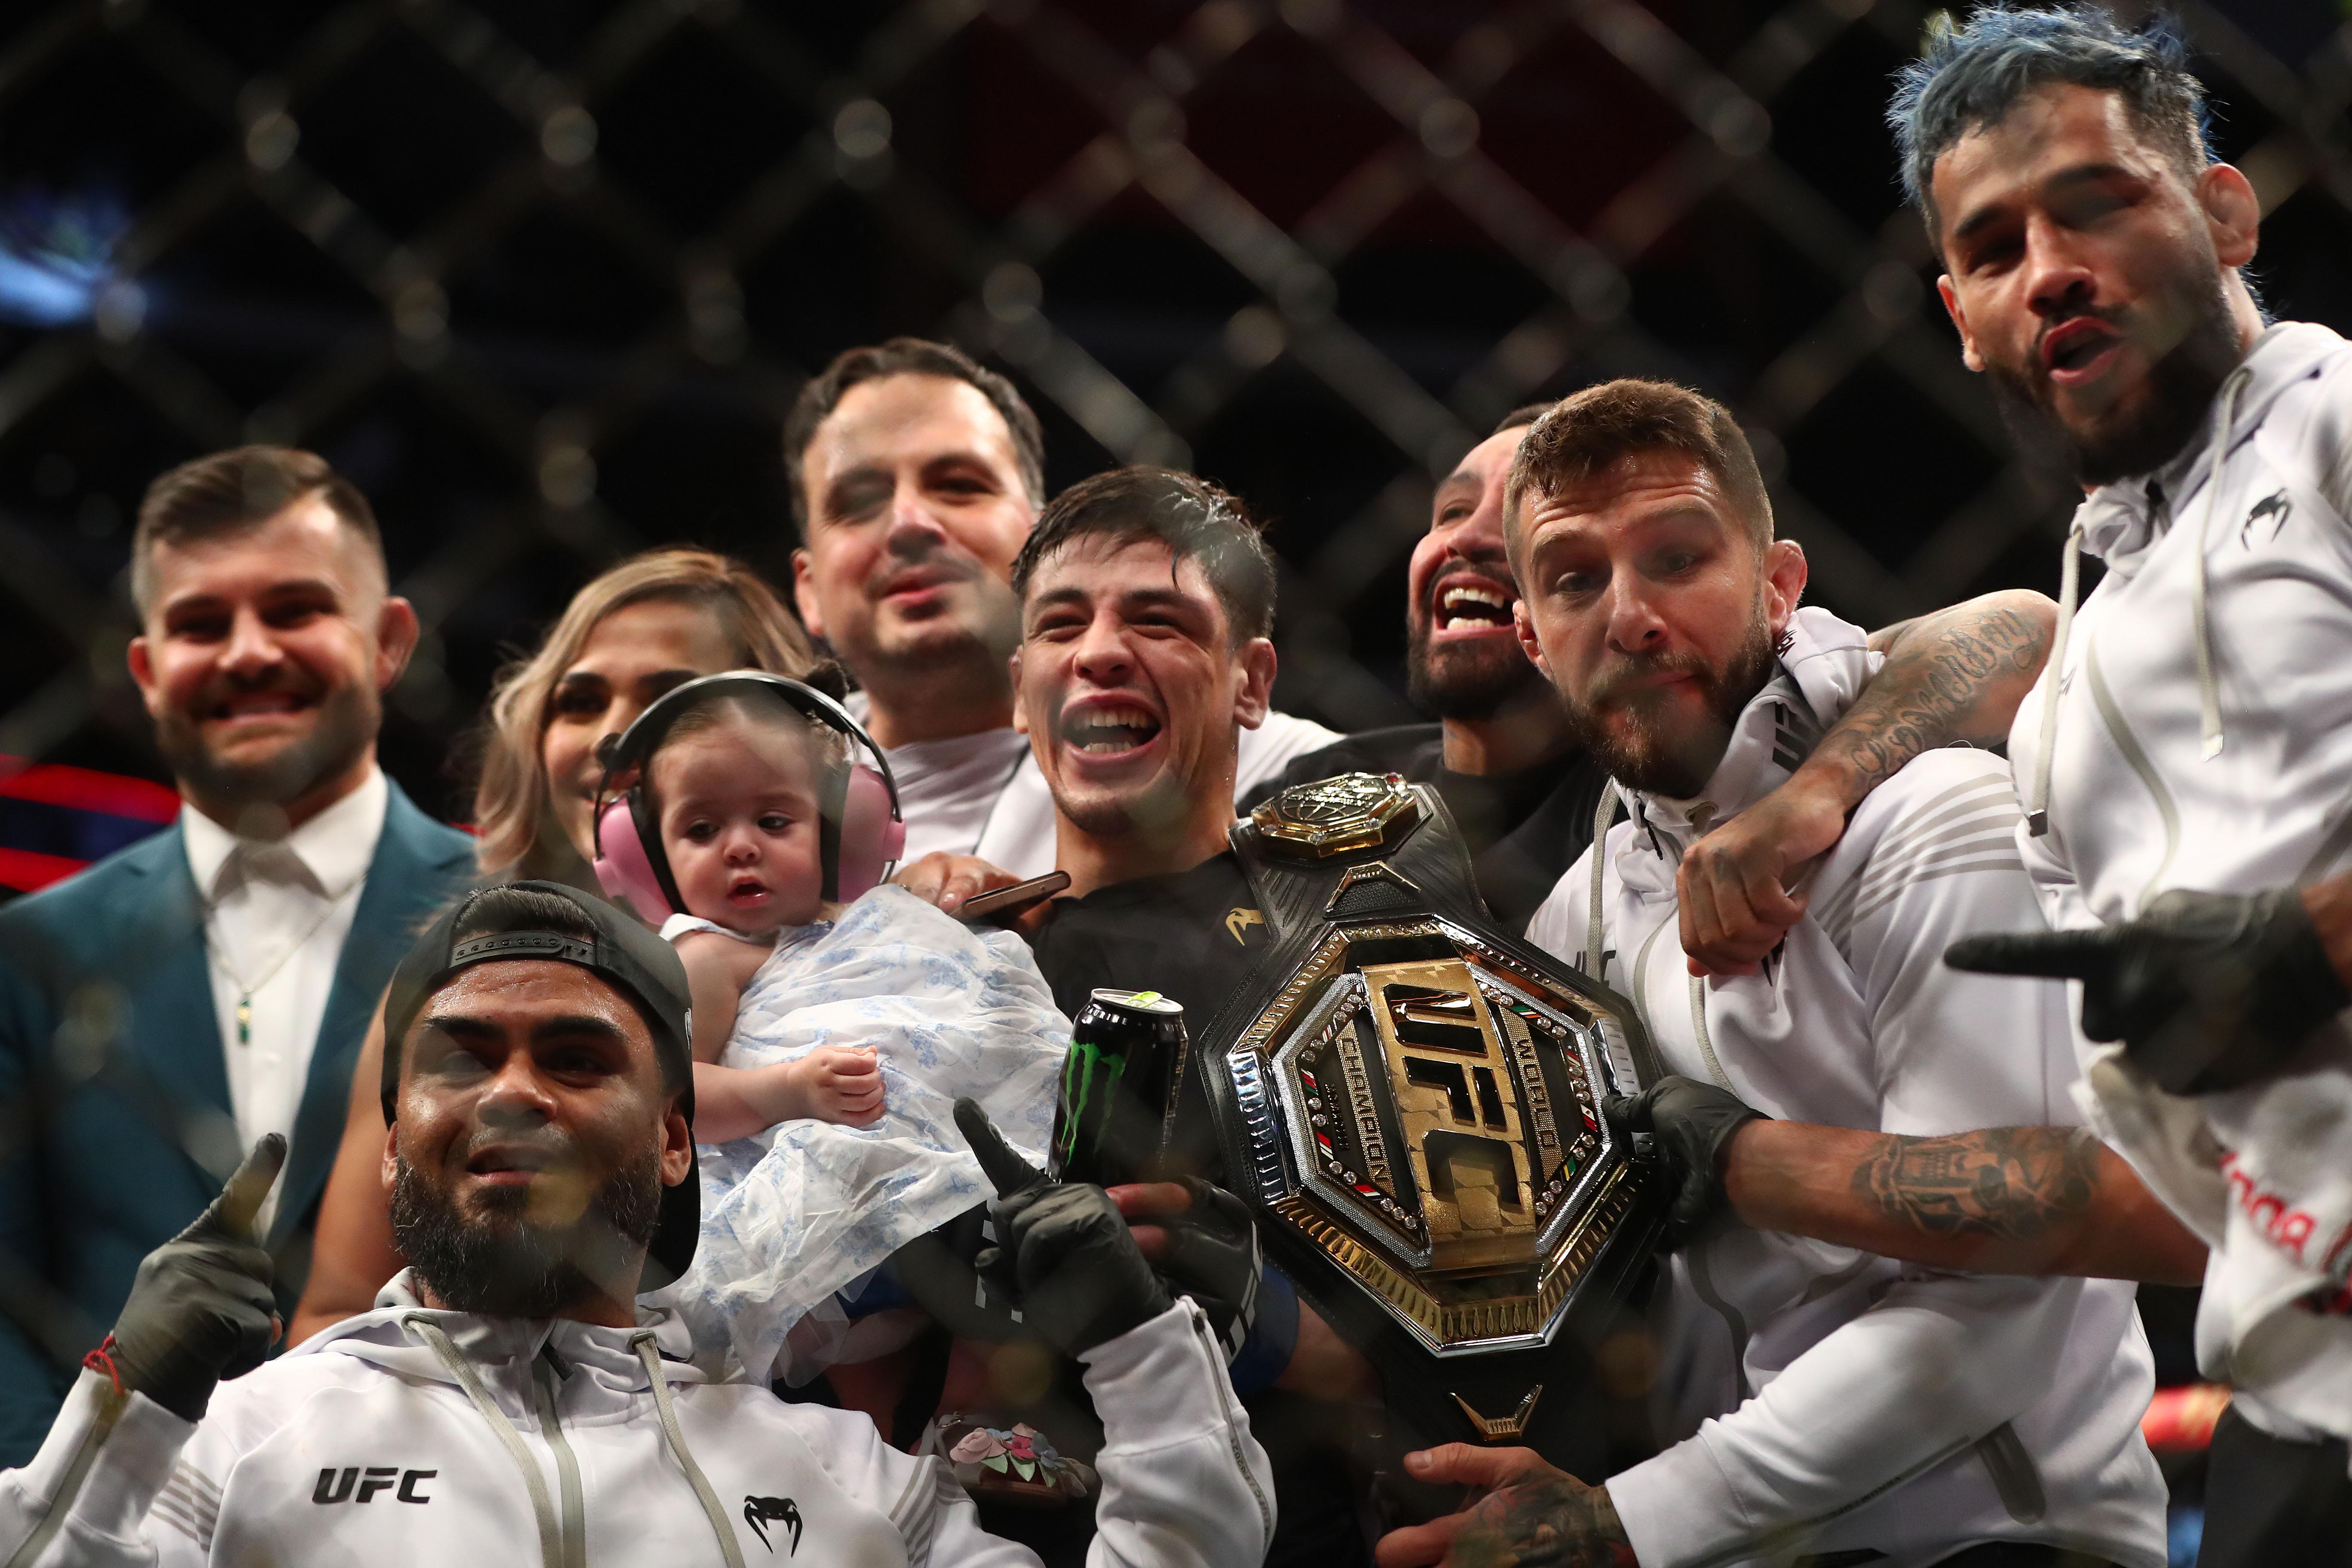 What Does Brandon Moreno's UFC 263 Title Triumph Mean for MMA?